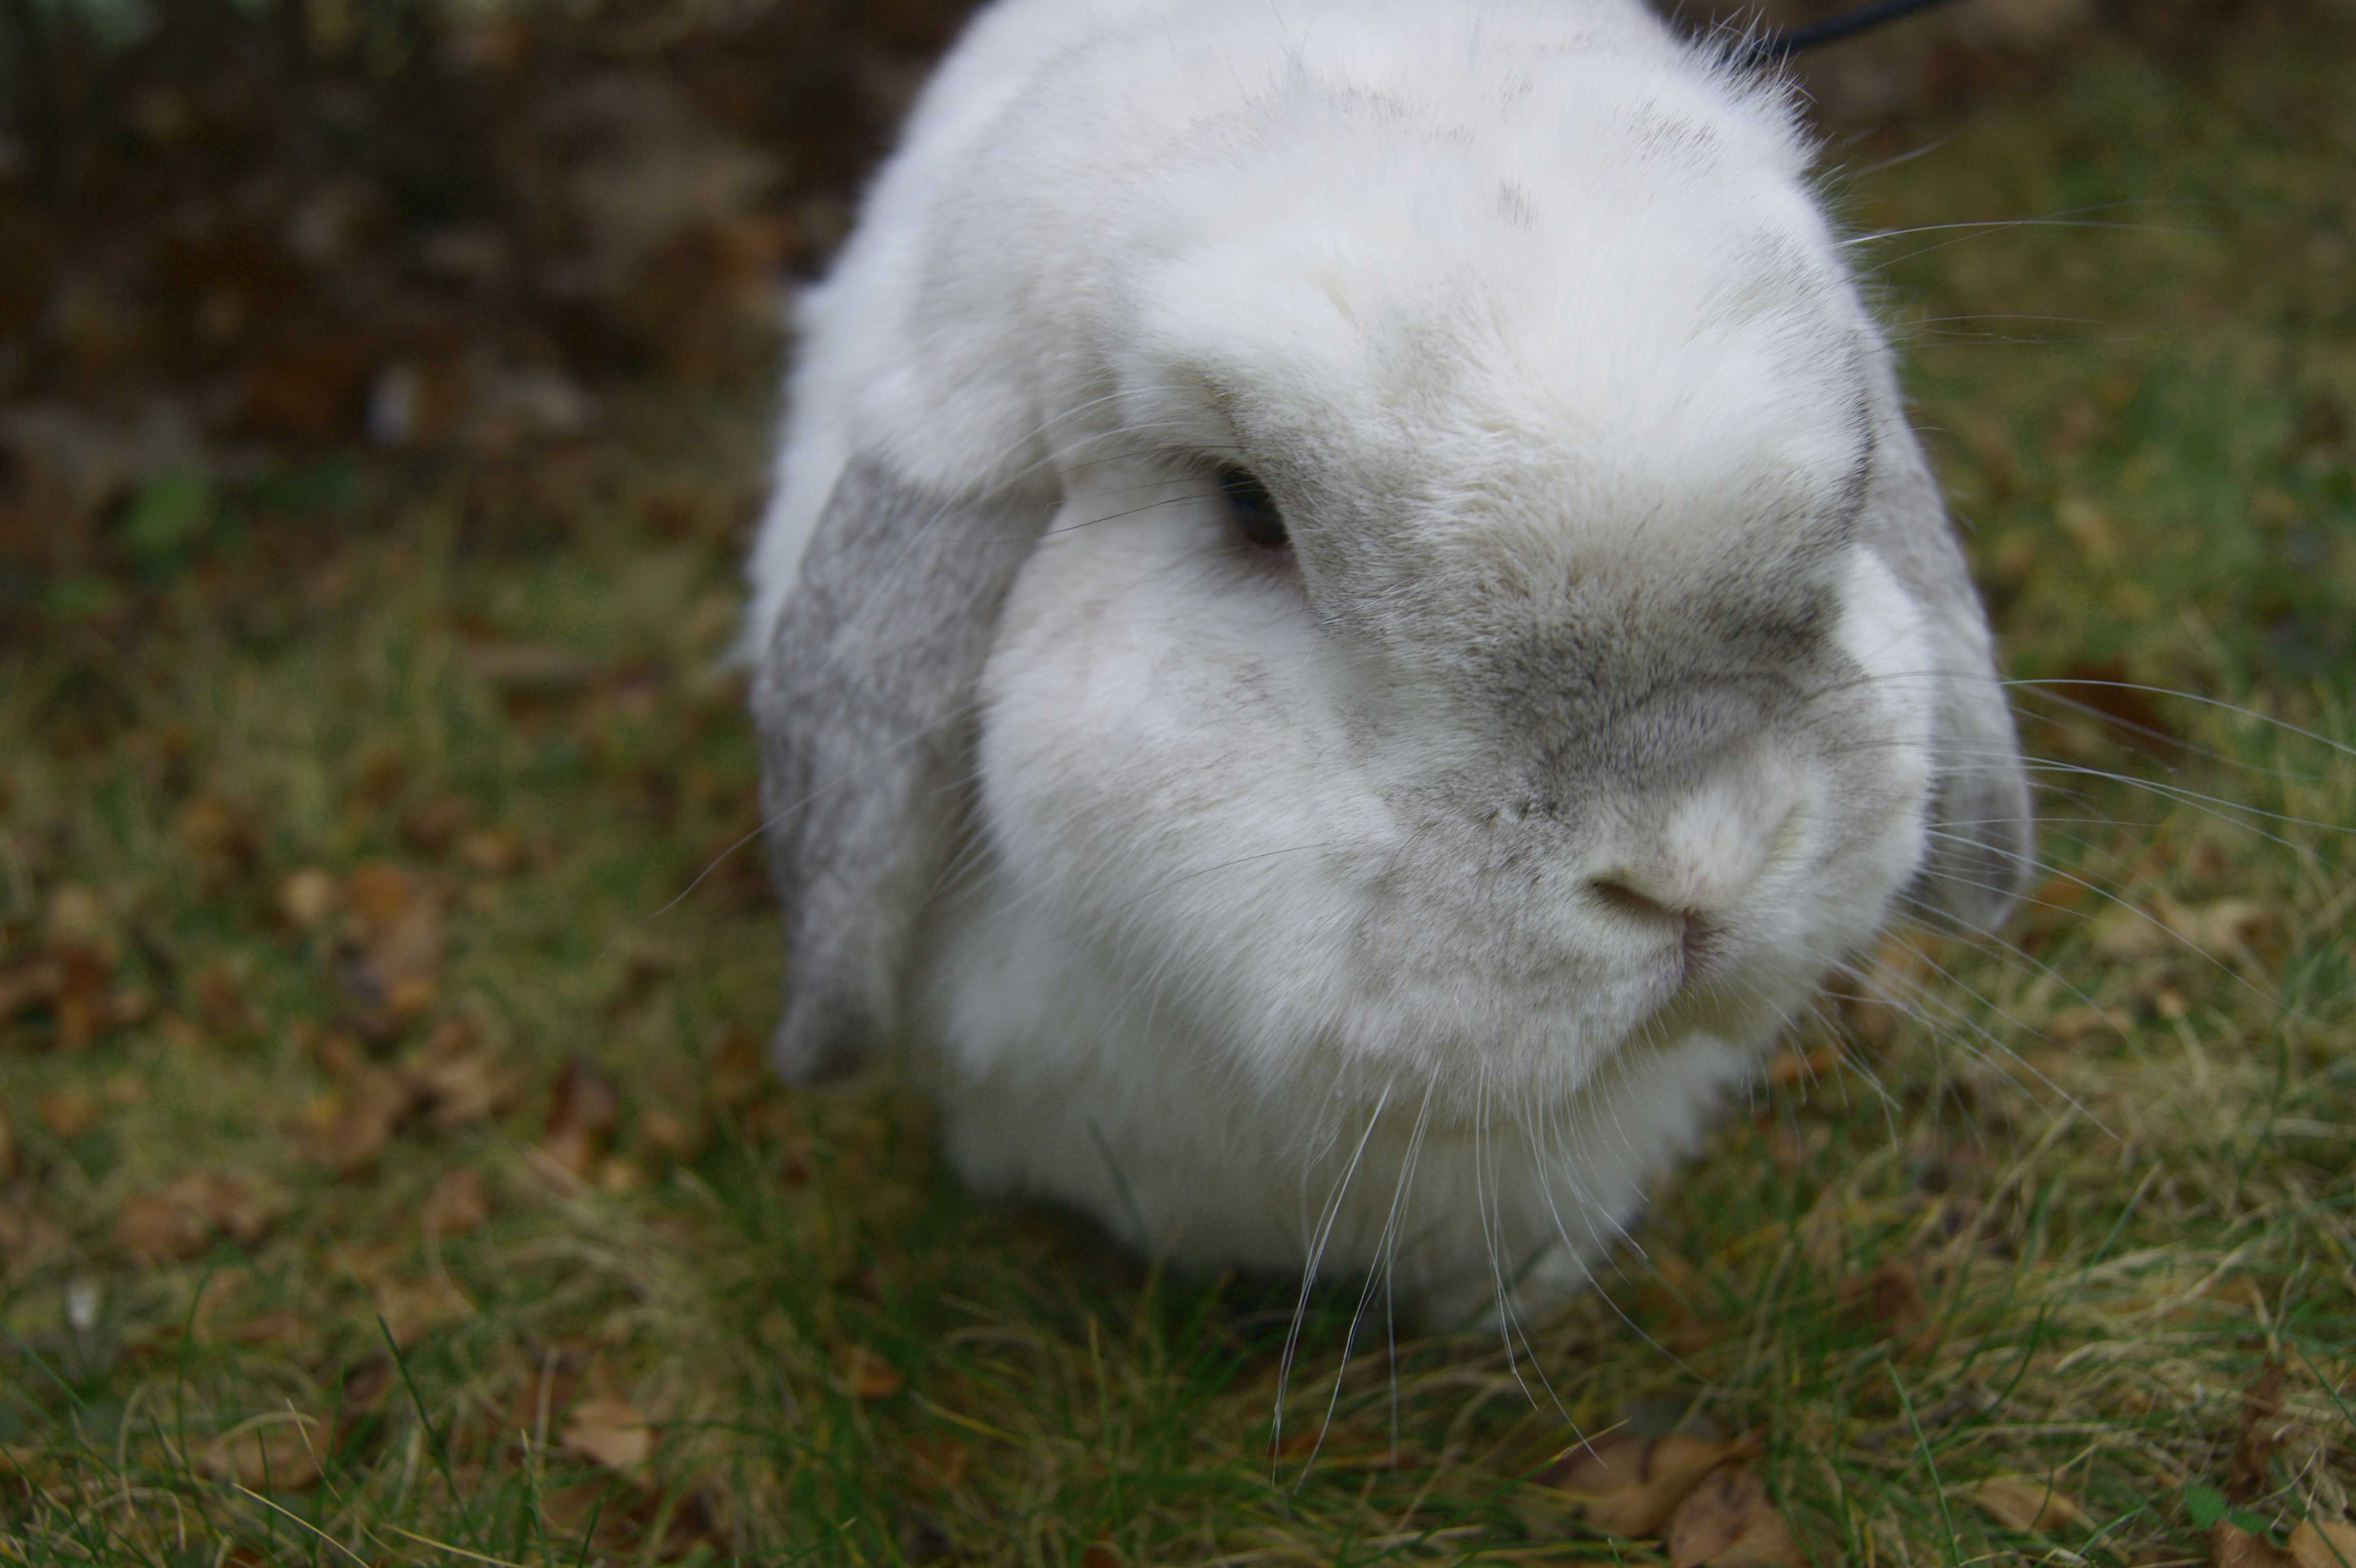 White rabbit in the grass